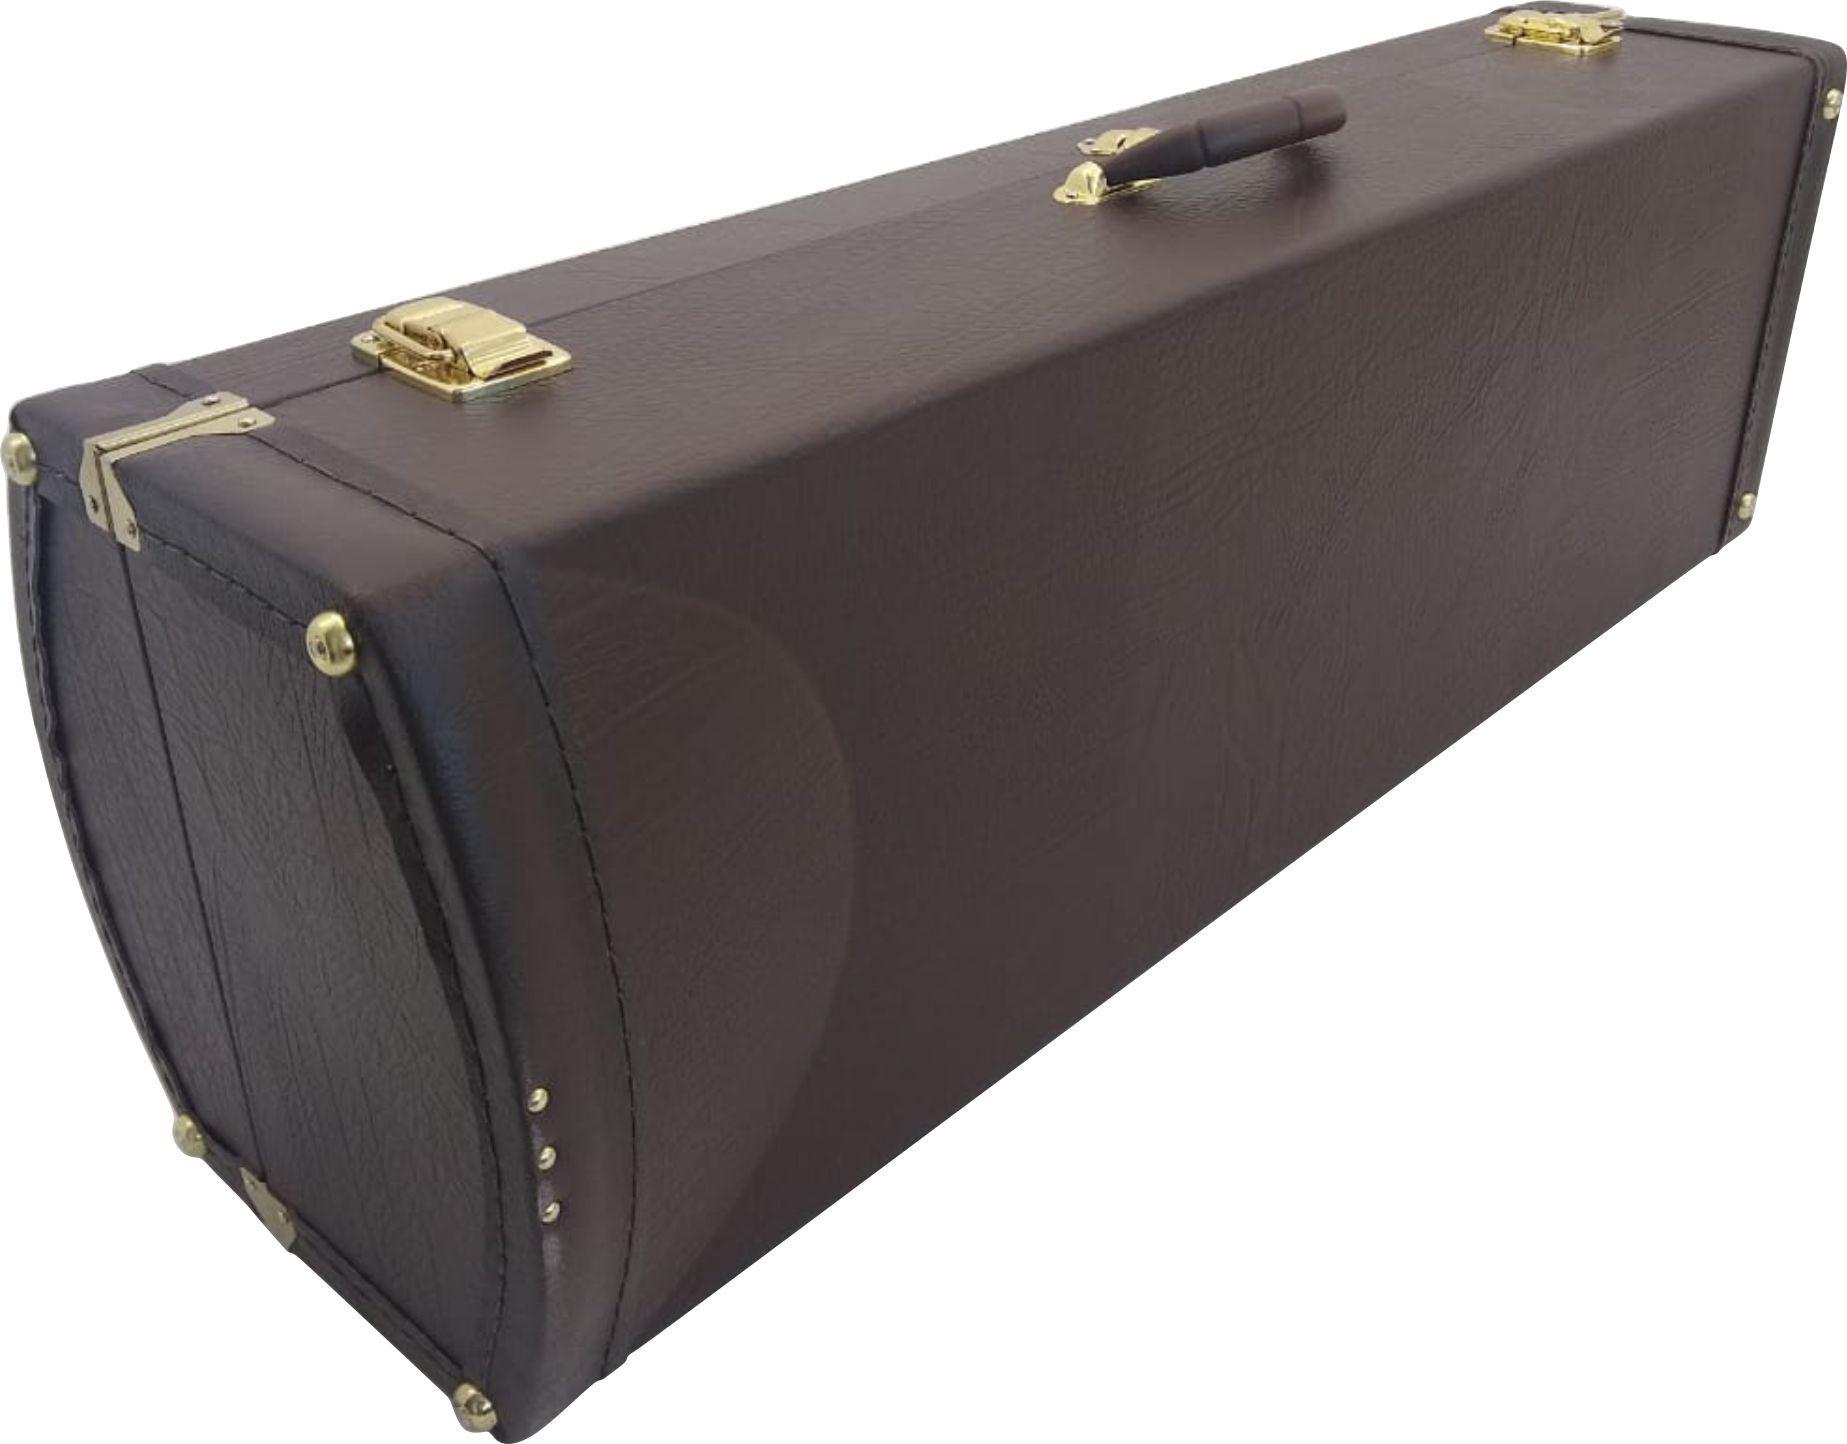 Estojo Case Para Trombone Médio F671 ou Similares